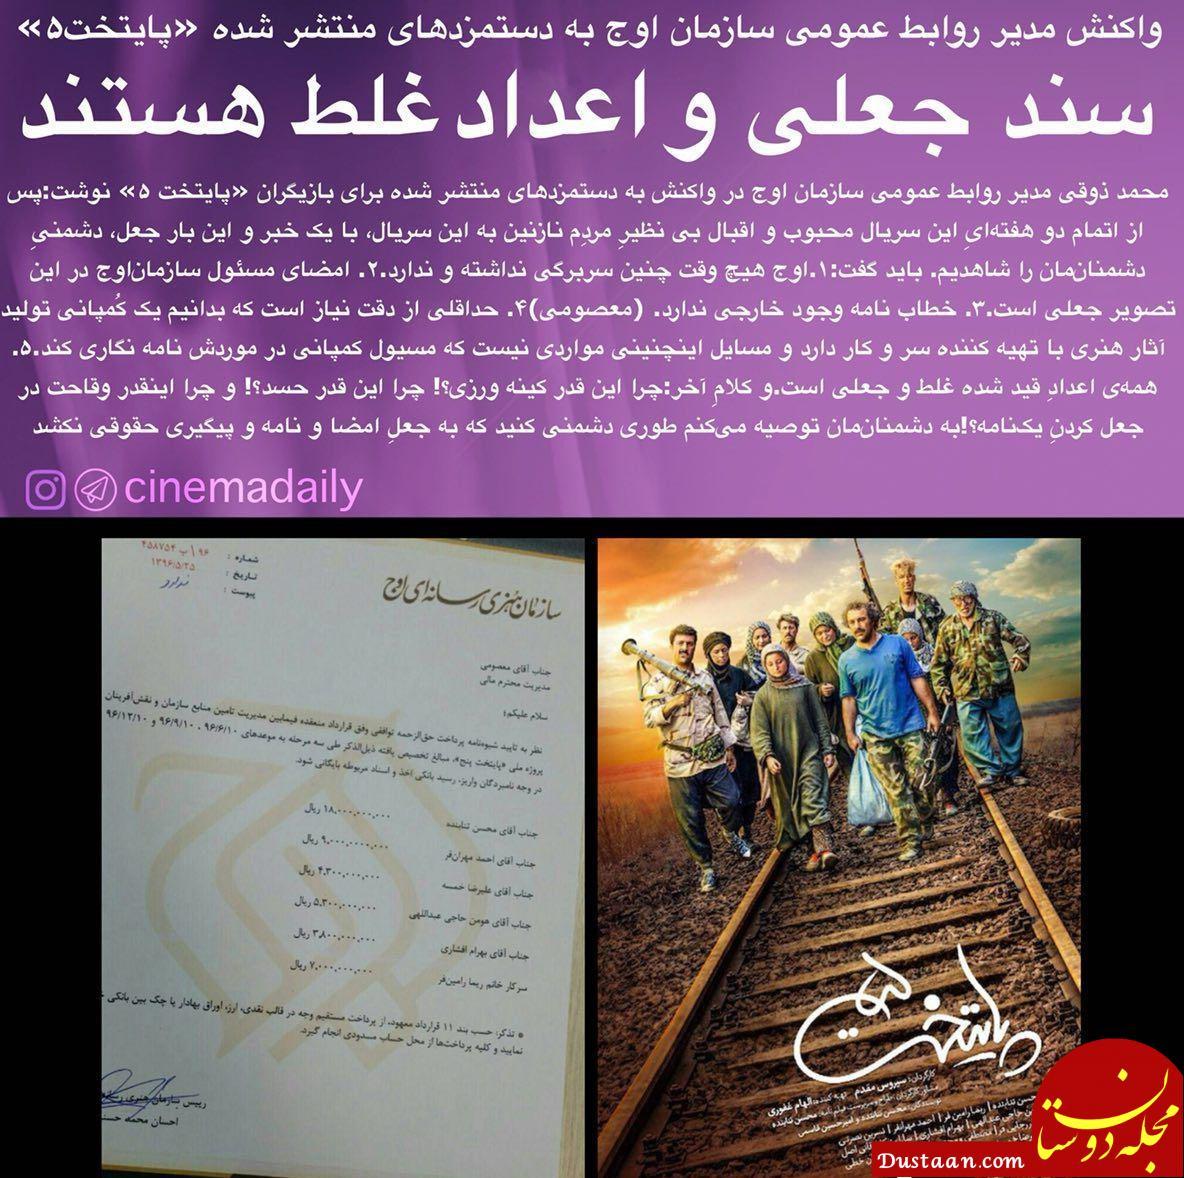 www.dustaan.com سند دستمزدهای «پایتخت۵» جعلی و اعداد غلط هستند